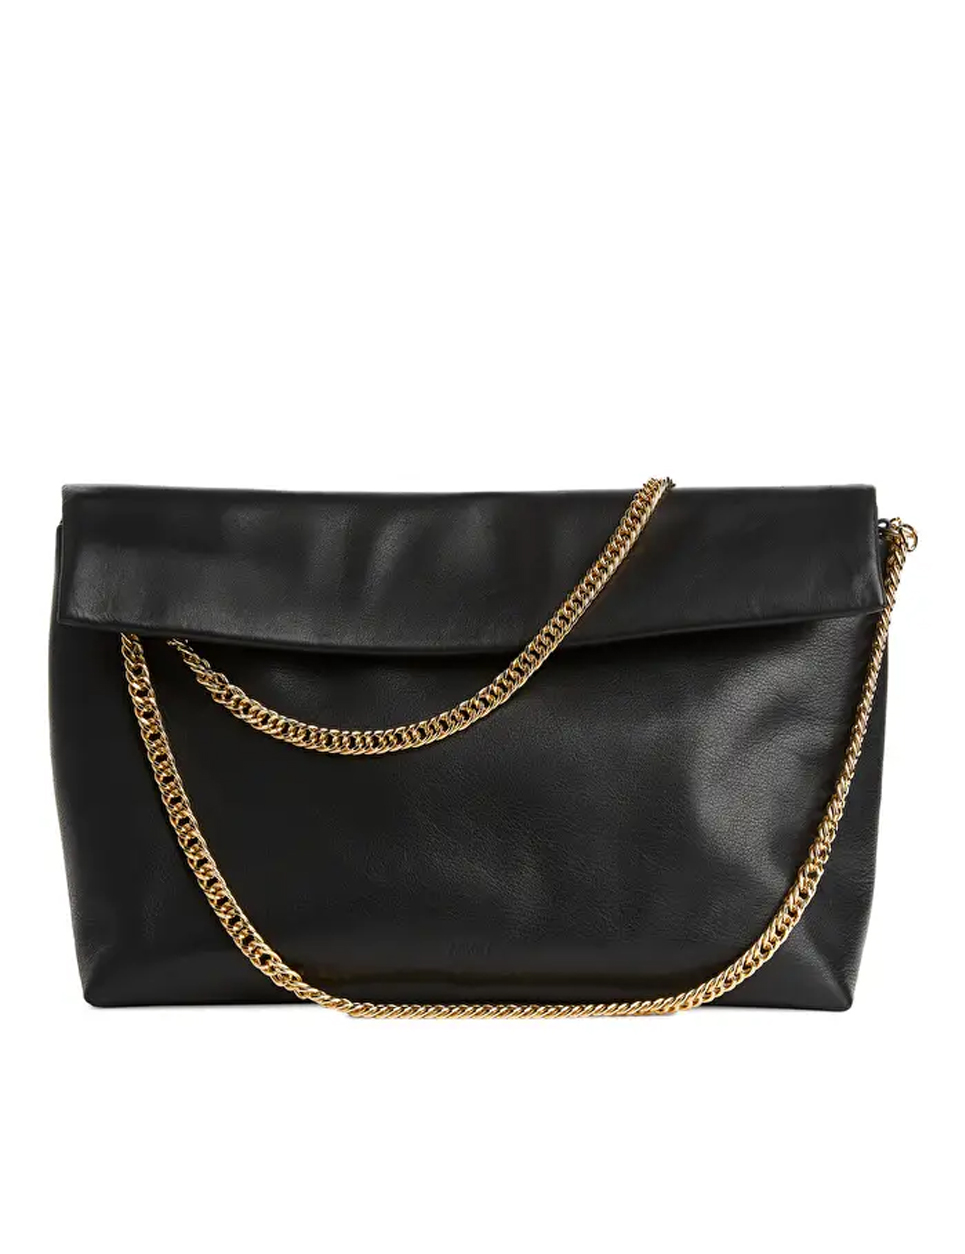 arket leather bag sale